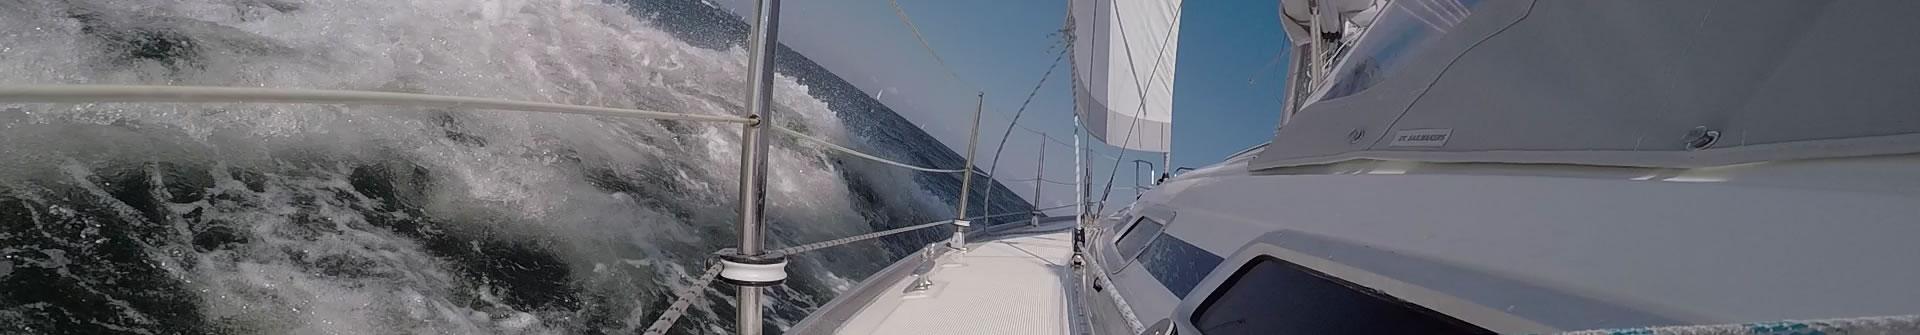 oscar_saililng